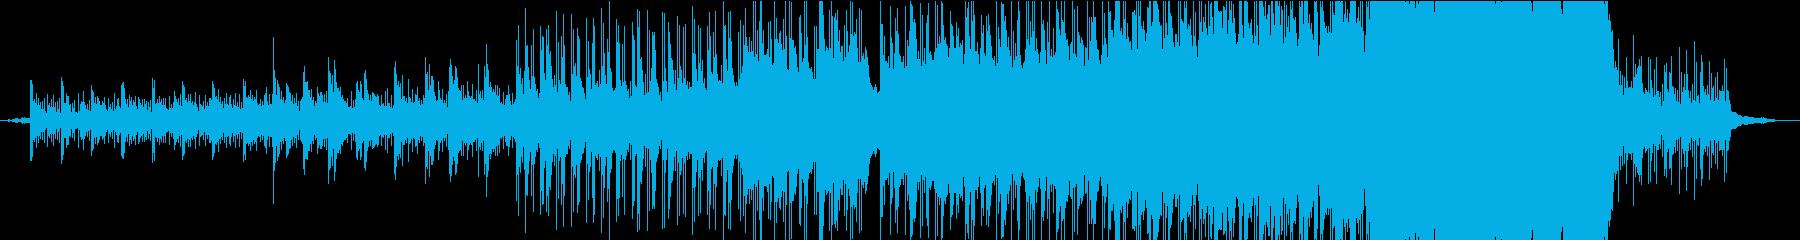 Elysian Castlesの再生済みの波形